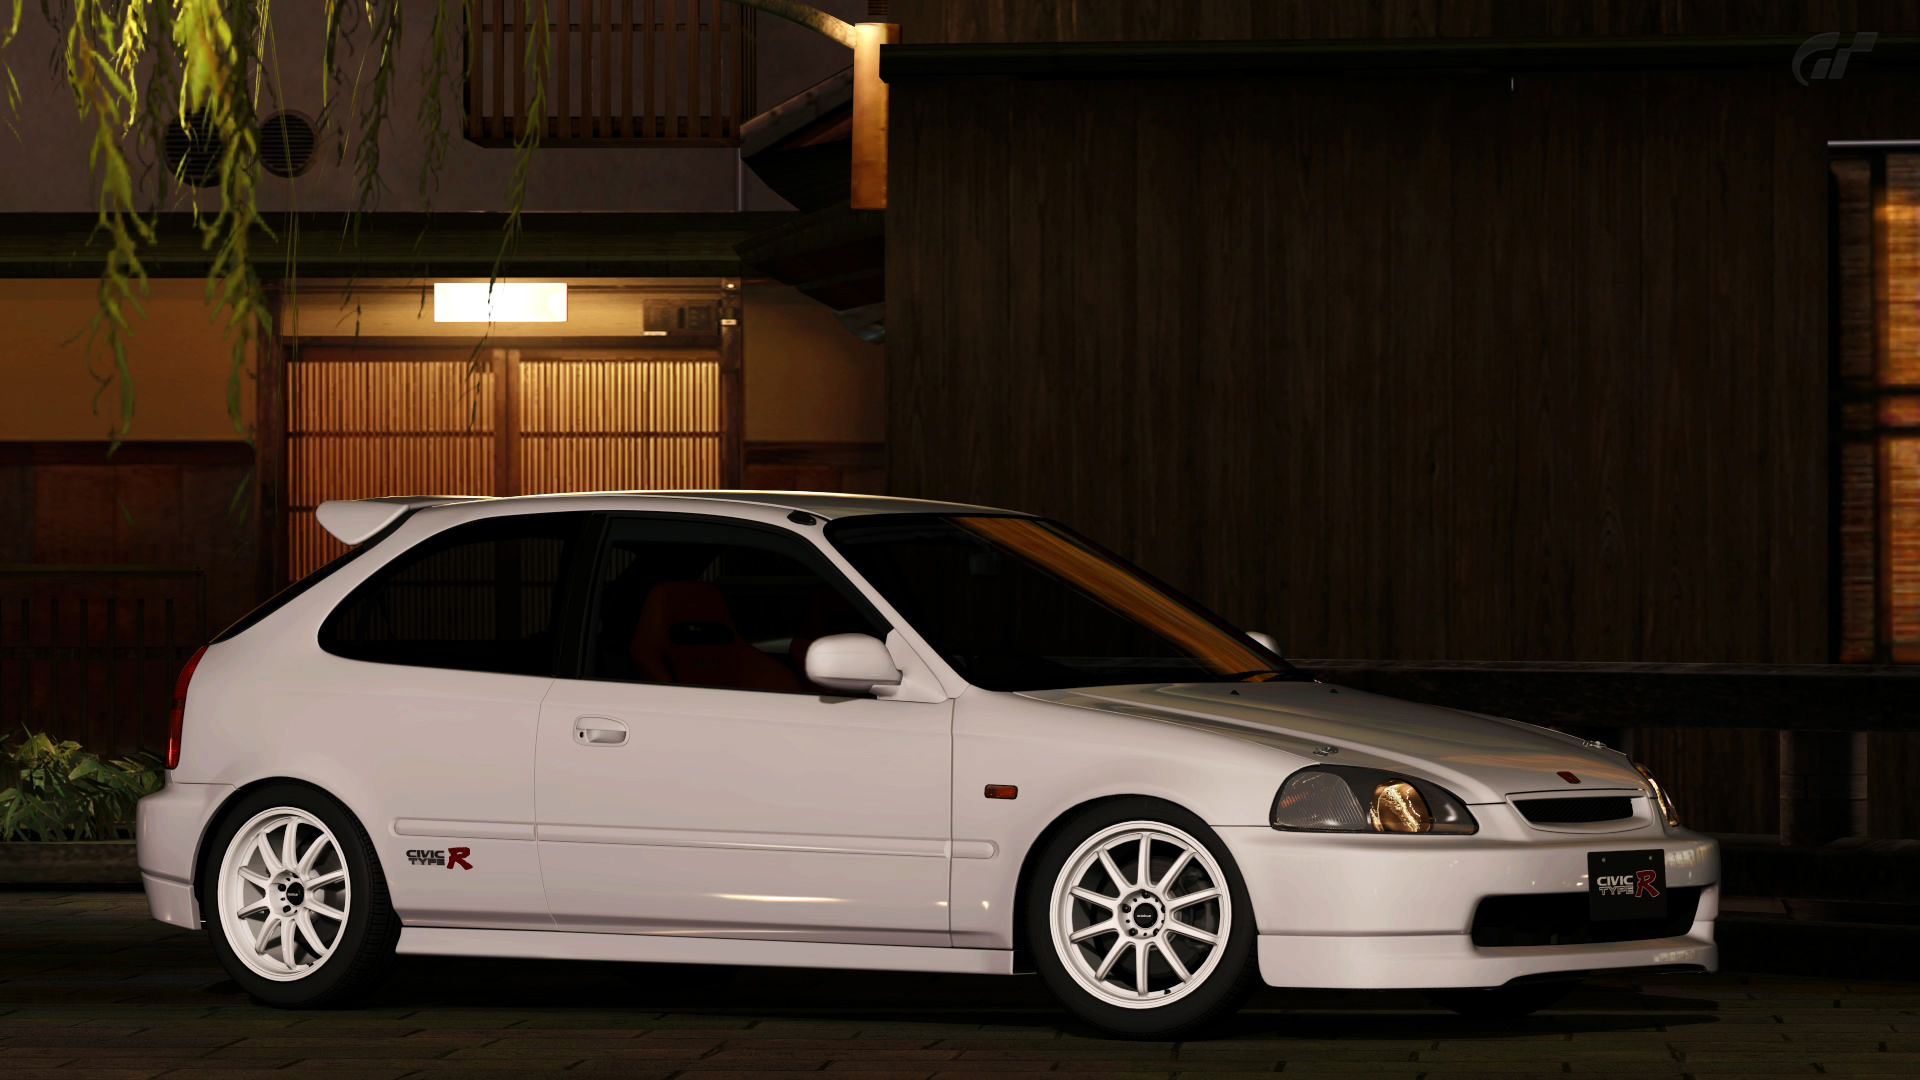 Honda Civic Ek Type R Wallpaper Picture EtB · Cars